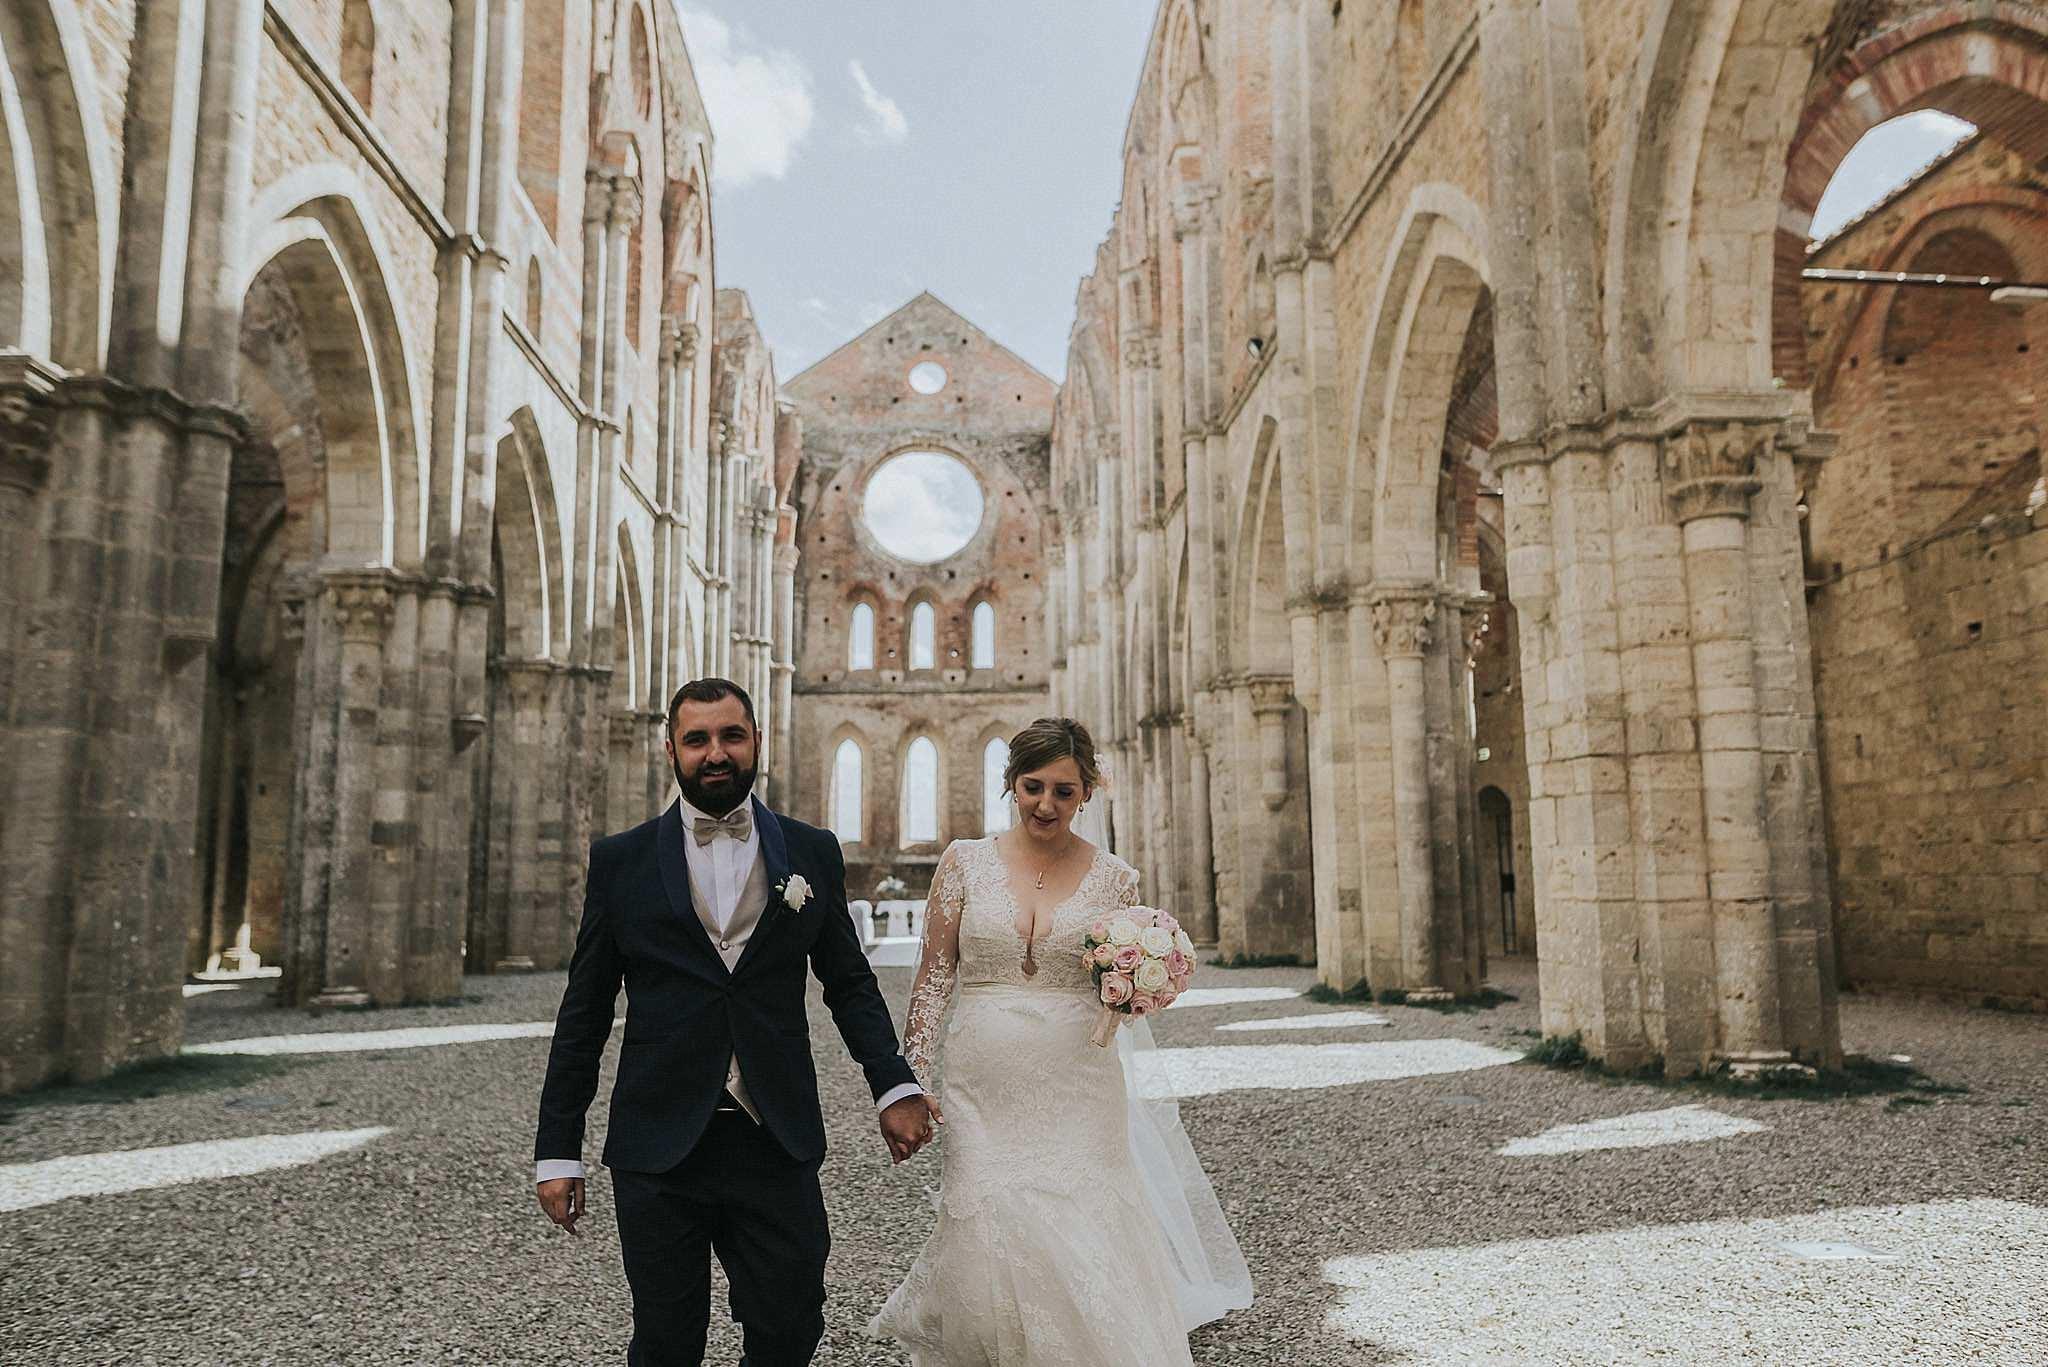 Matrimonio A Toscana : Fotos de matrimonio excellent el certificado